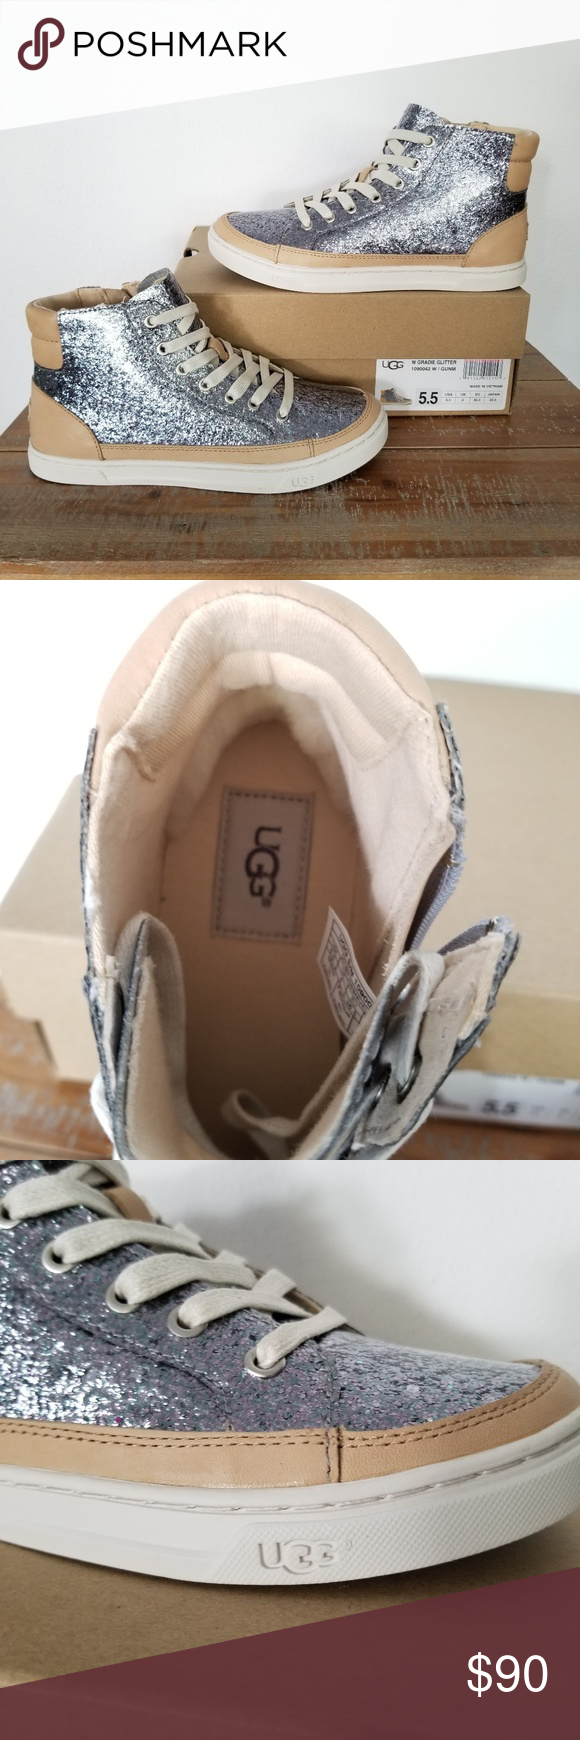 b7d460f22a9 UGG Gladie Glitter High-Top Sneakers Brand NEW UGG Gradie High-Top ...